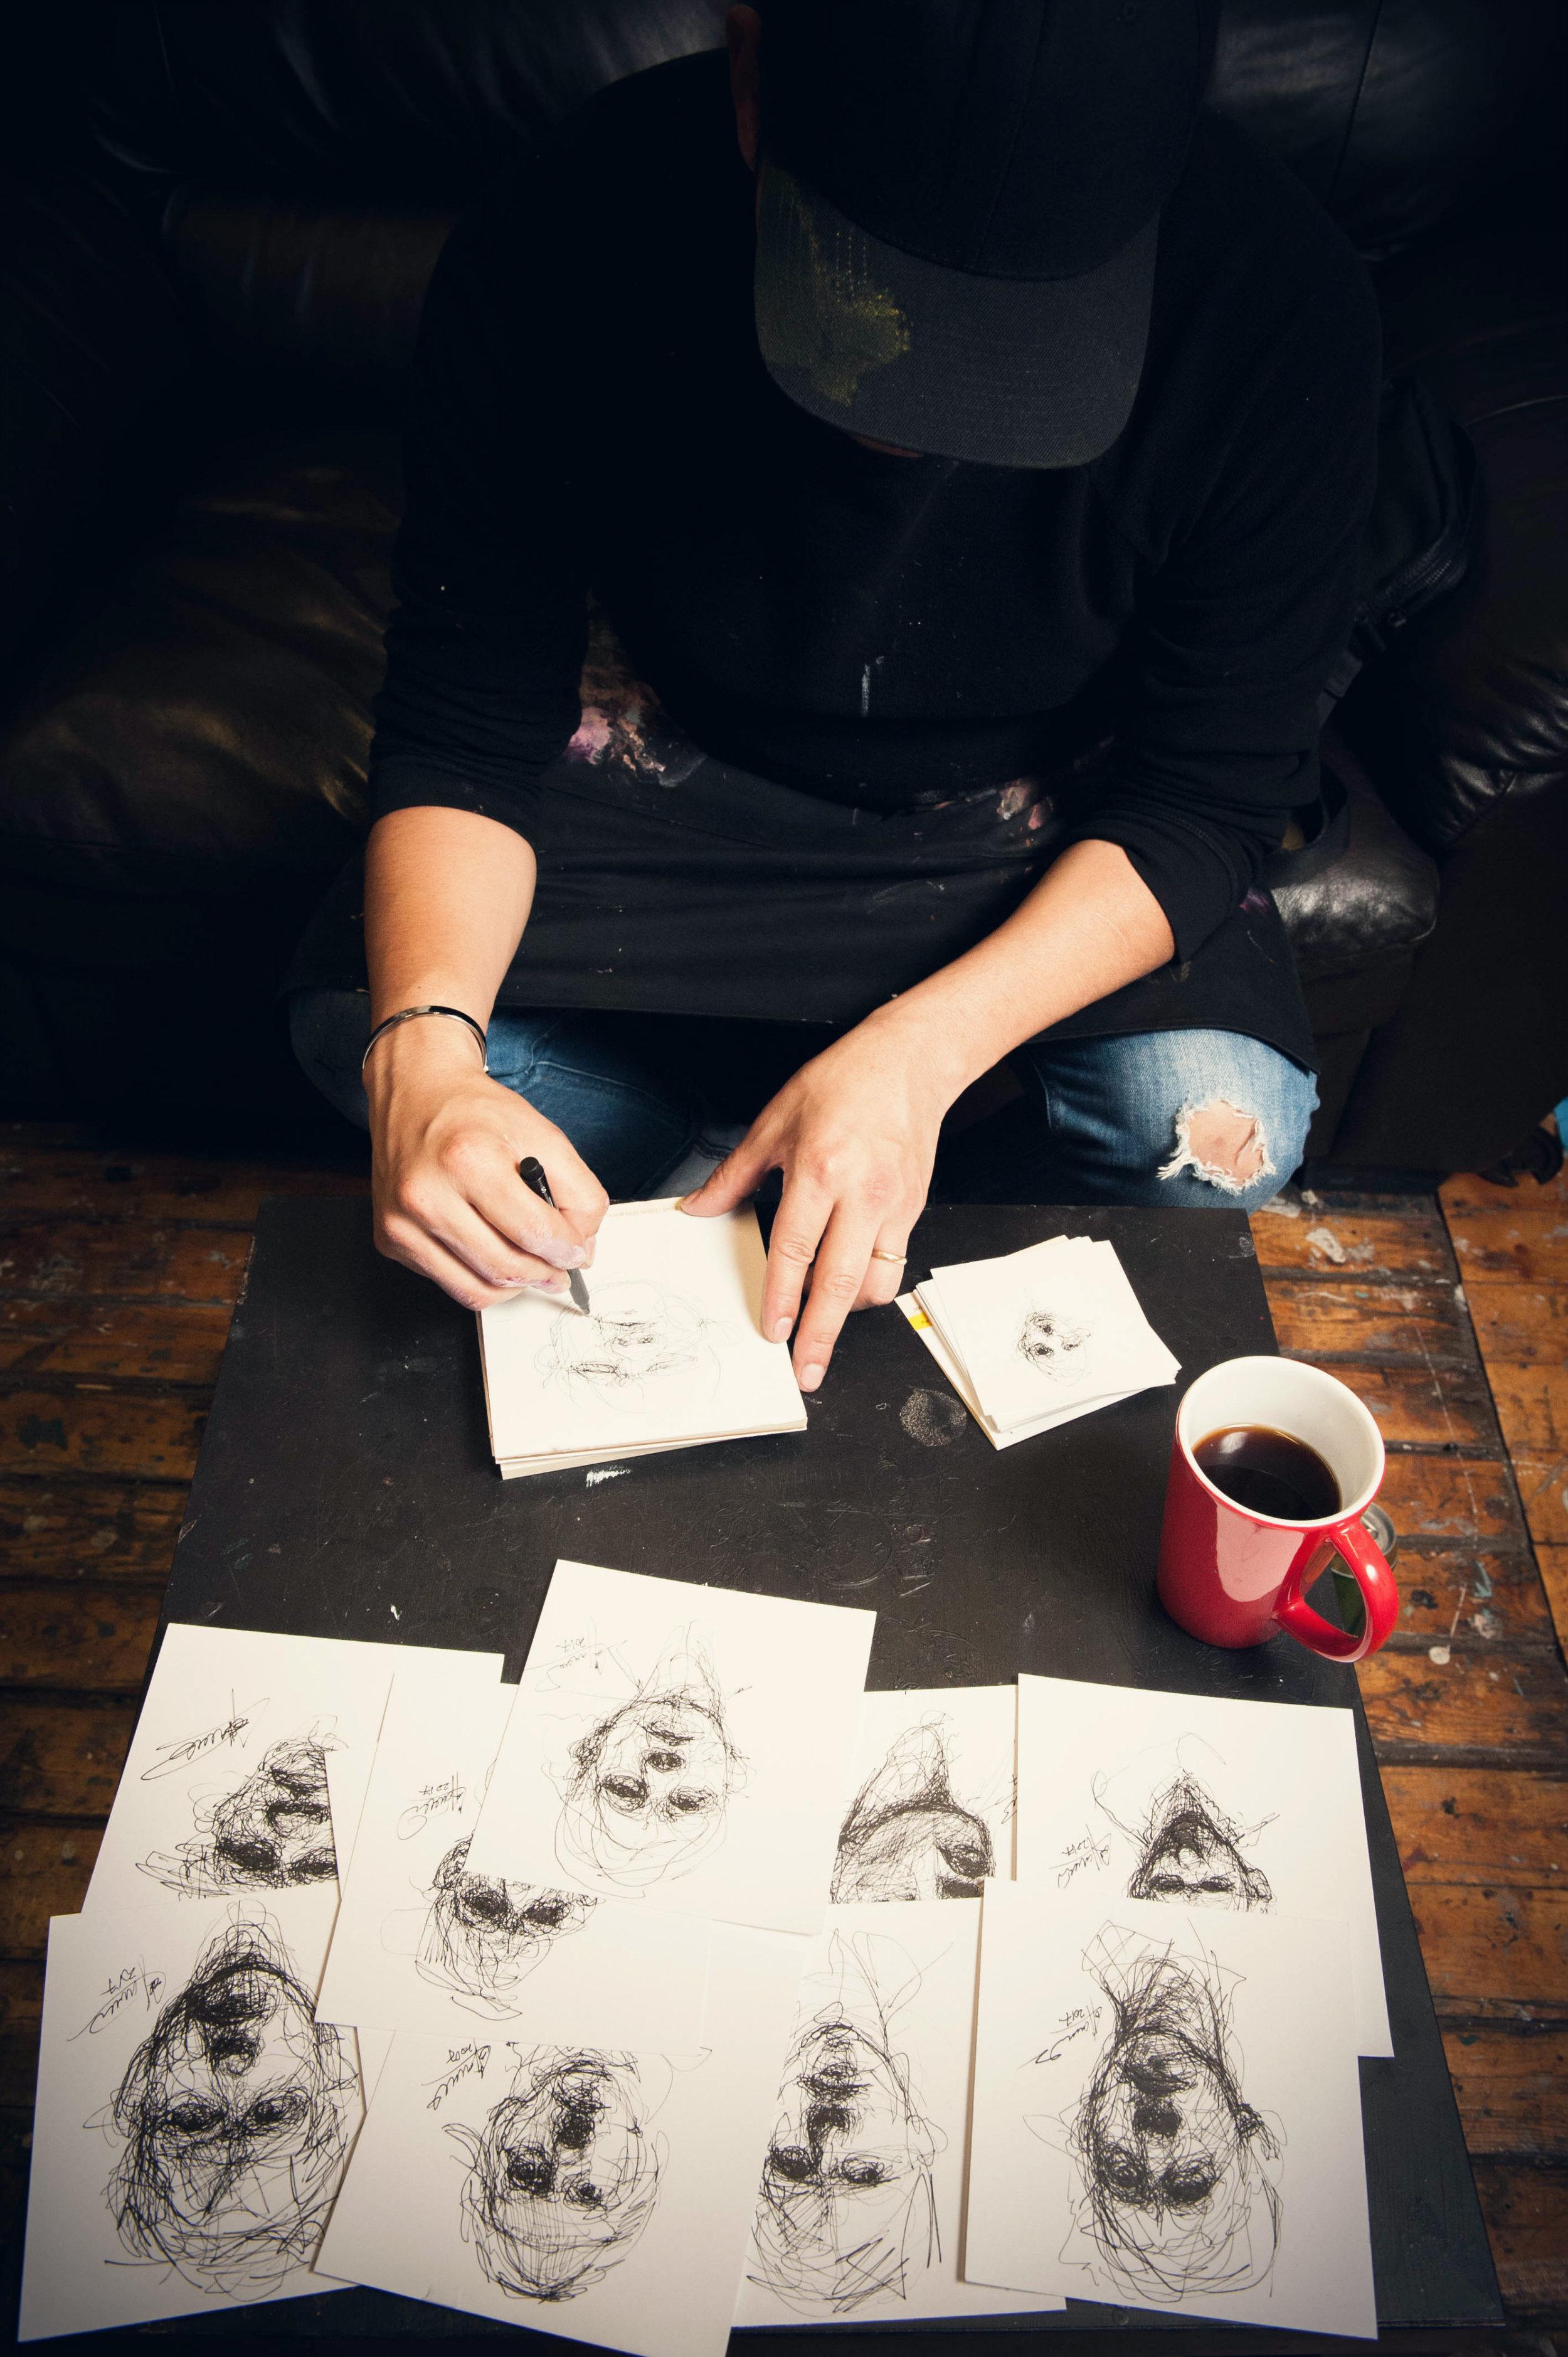 Drawing small scale sketches. Carlos Delgado in his studio in Toronto. Photo by Alex Usquiano.